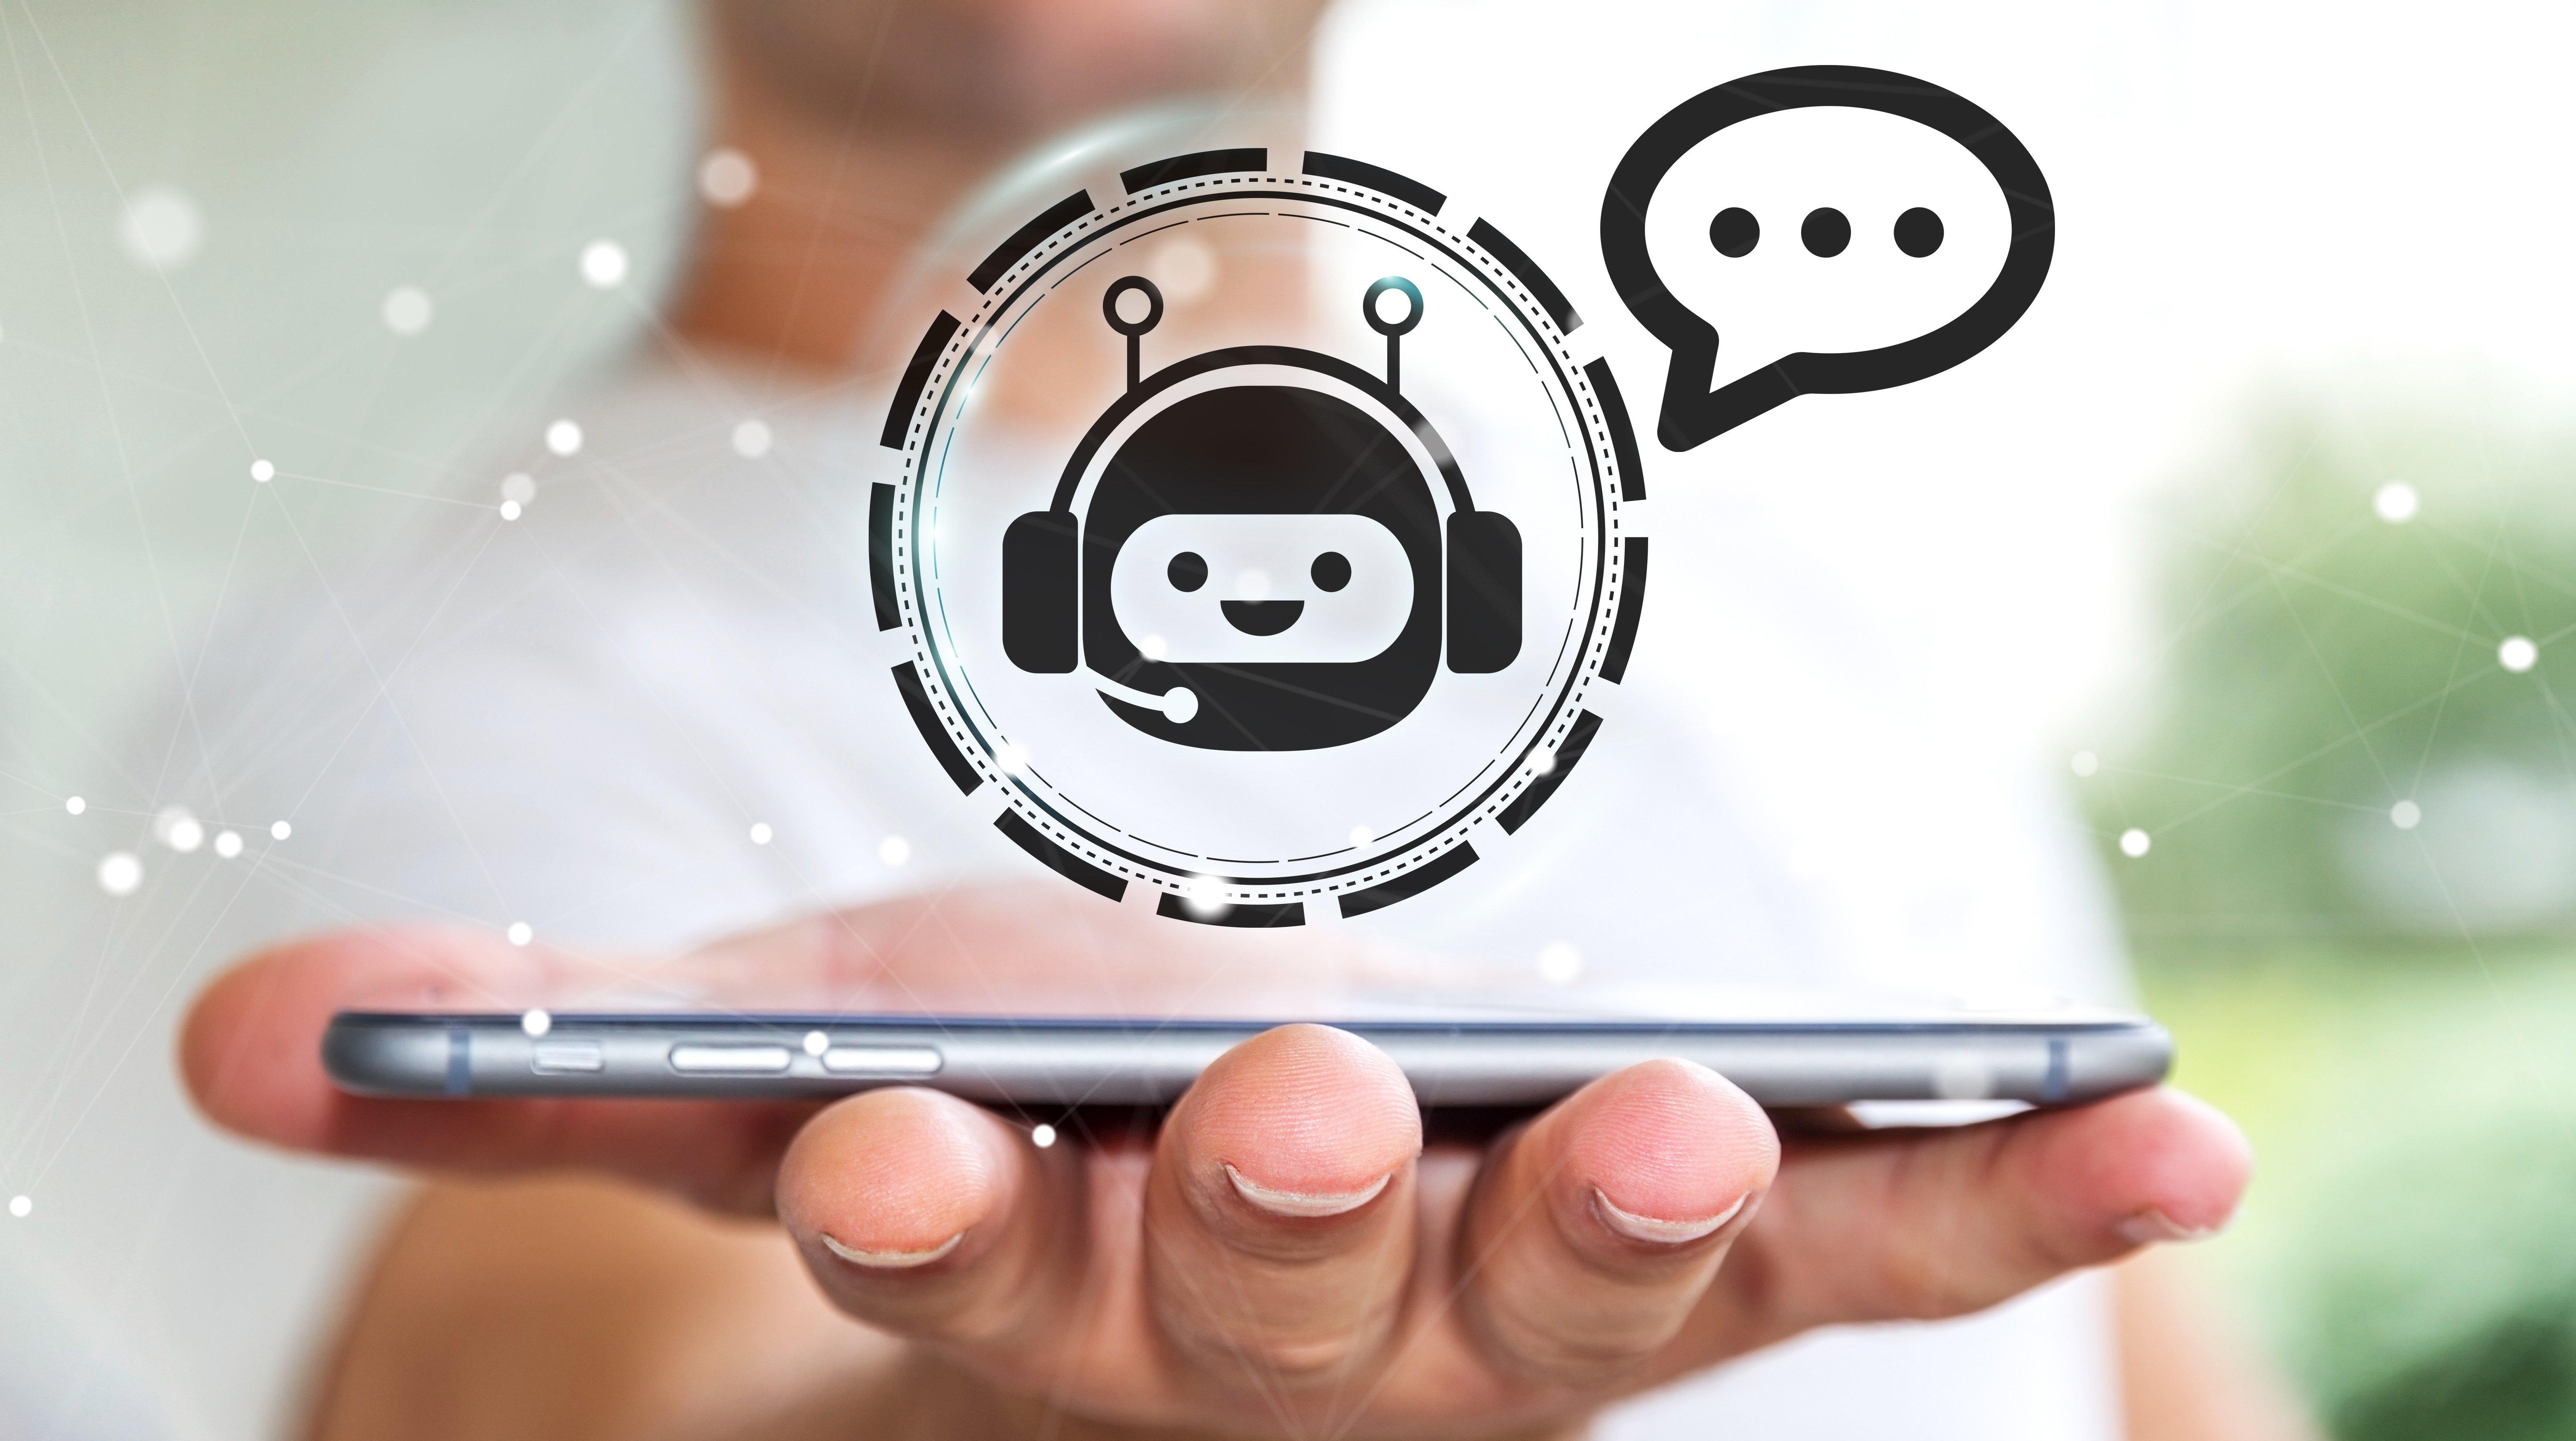 Chatbots Provide Convenience